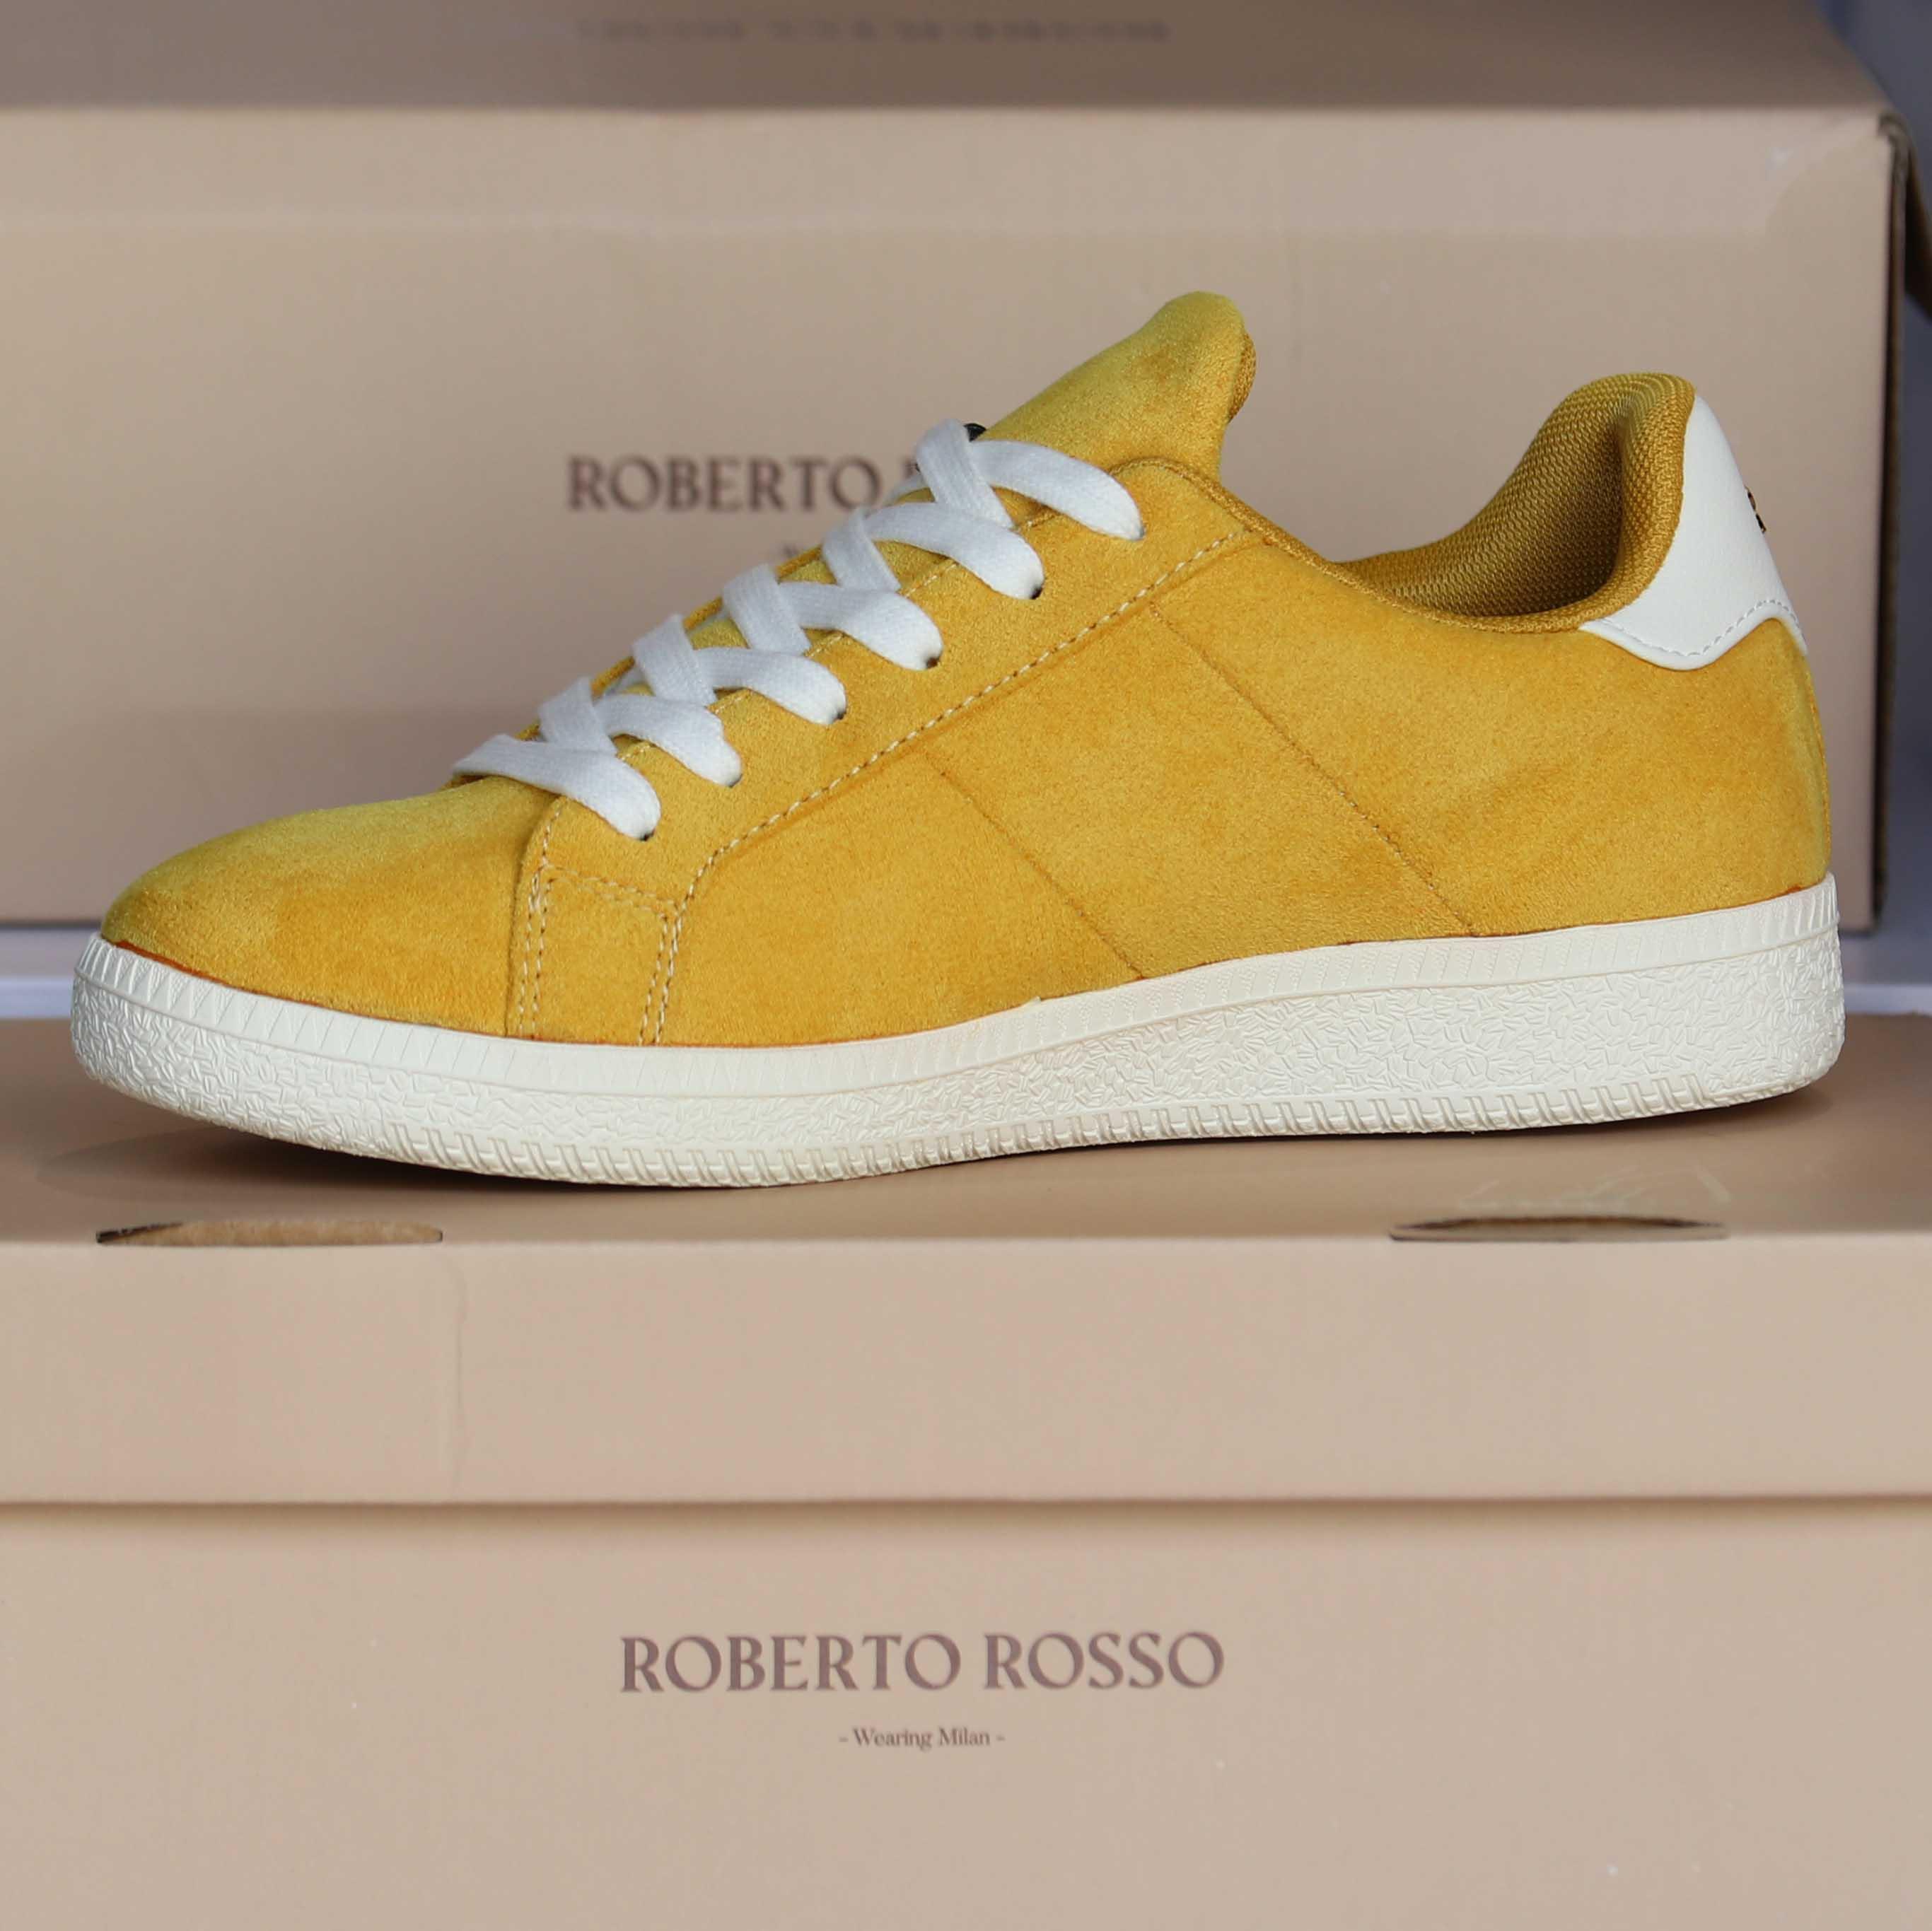 roberto rosso portiva yellow dame sko sommer4